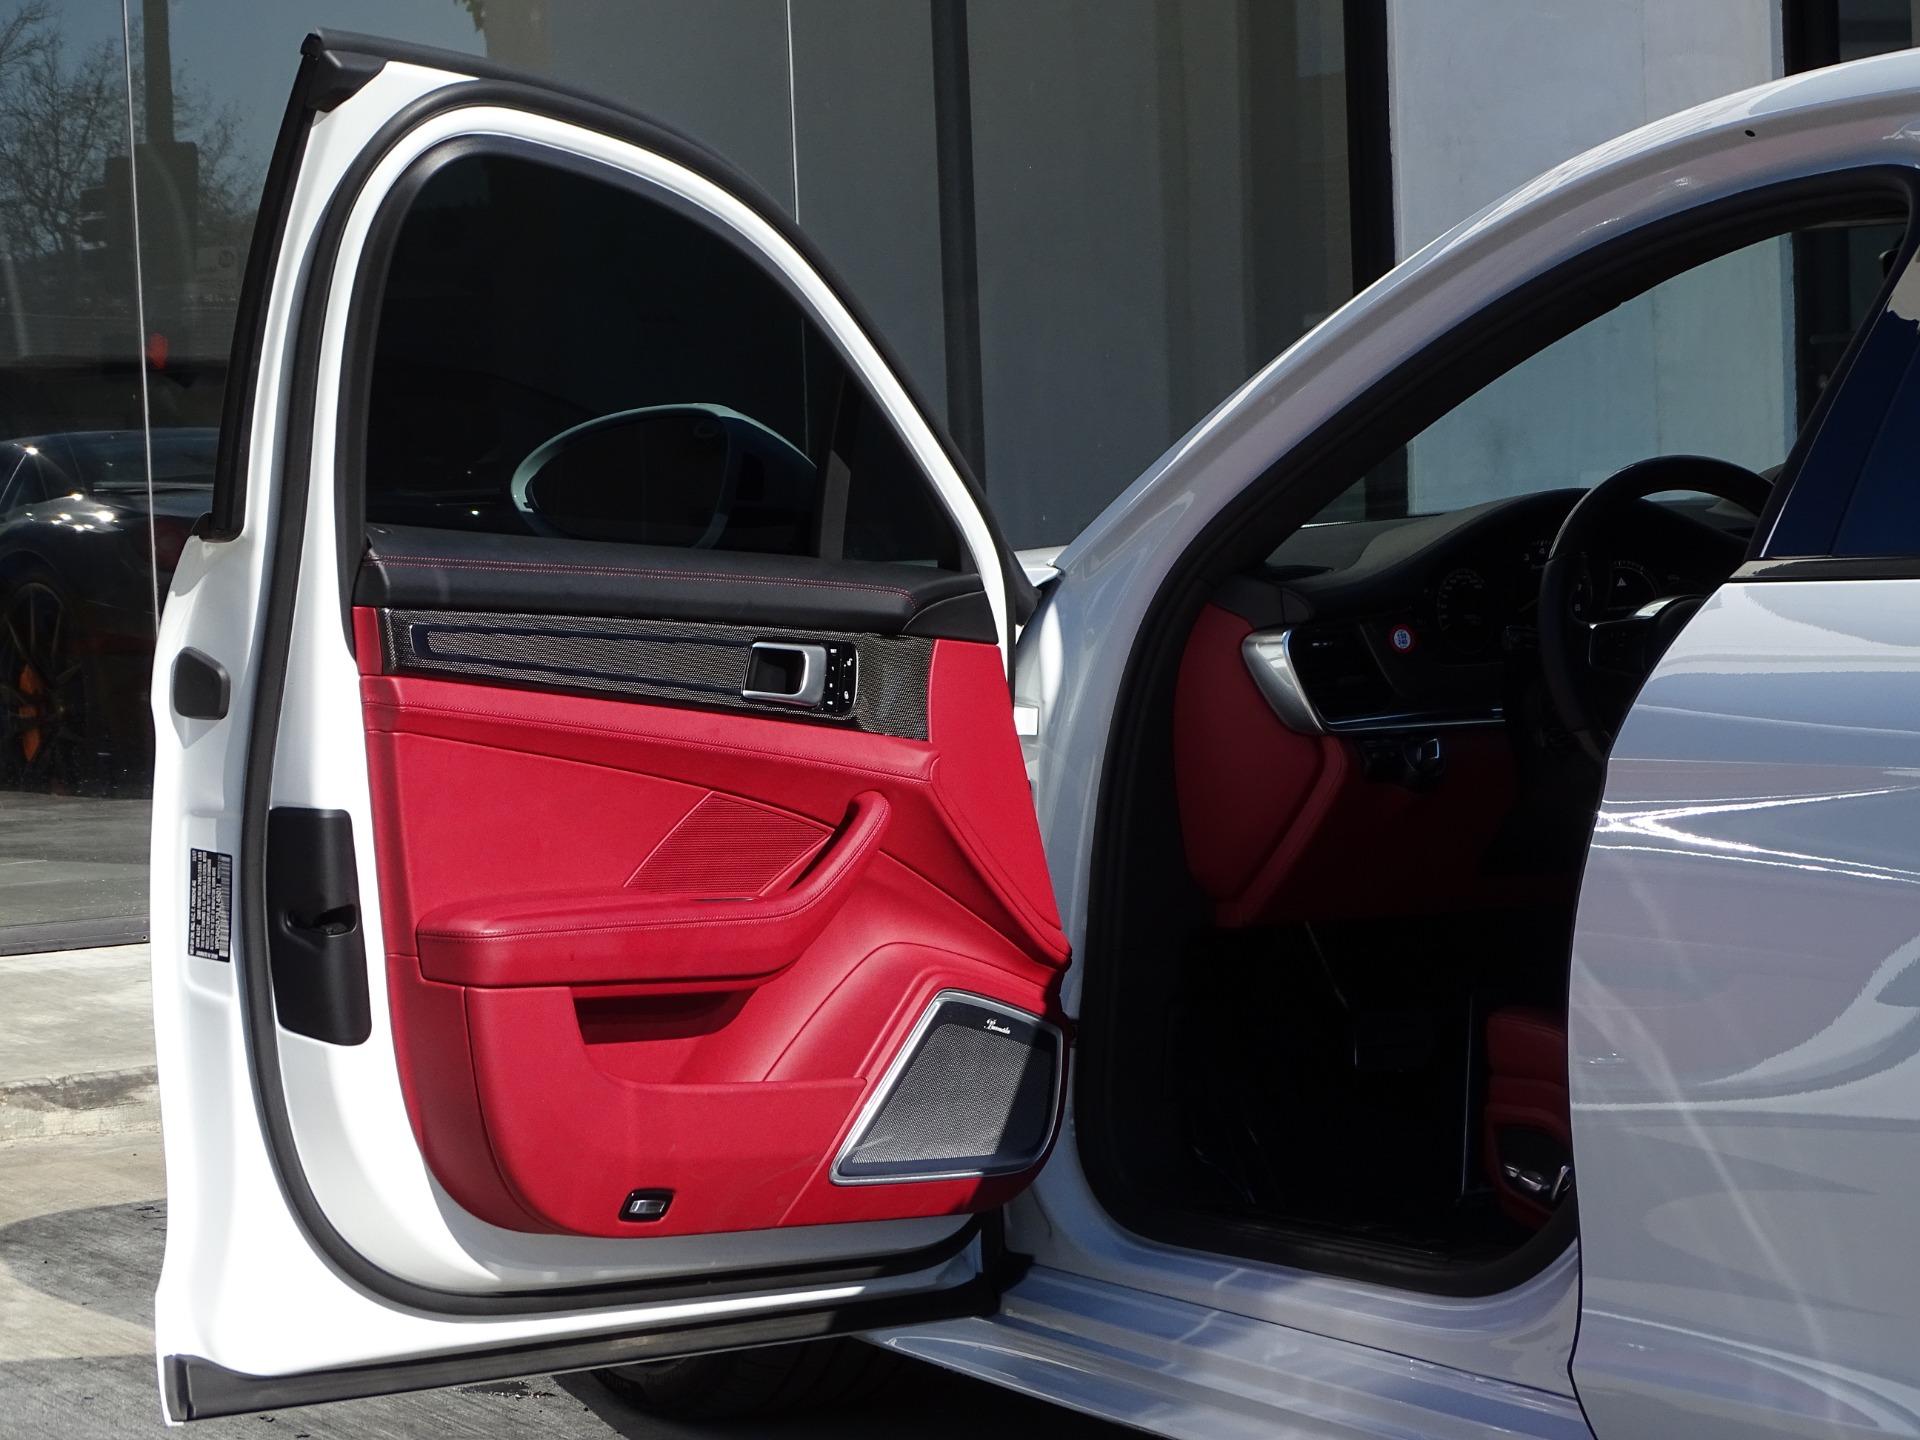 Used-2018-Porsche-Panamera-Turbo-S-E-Hybrid